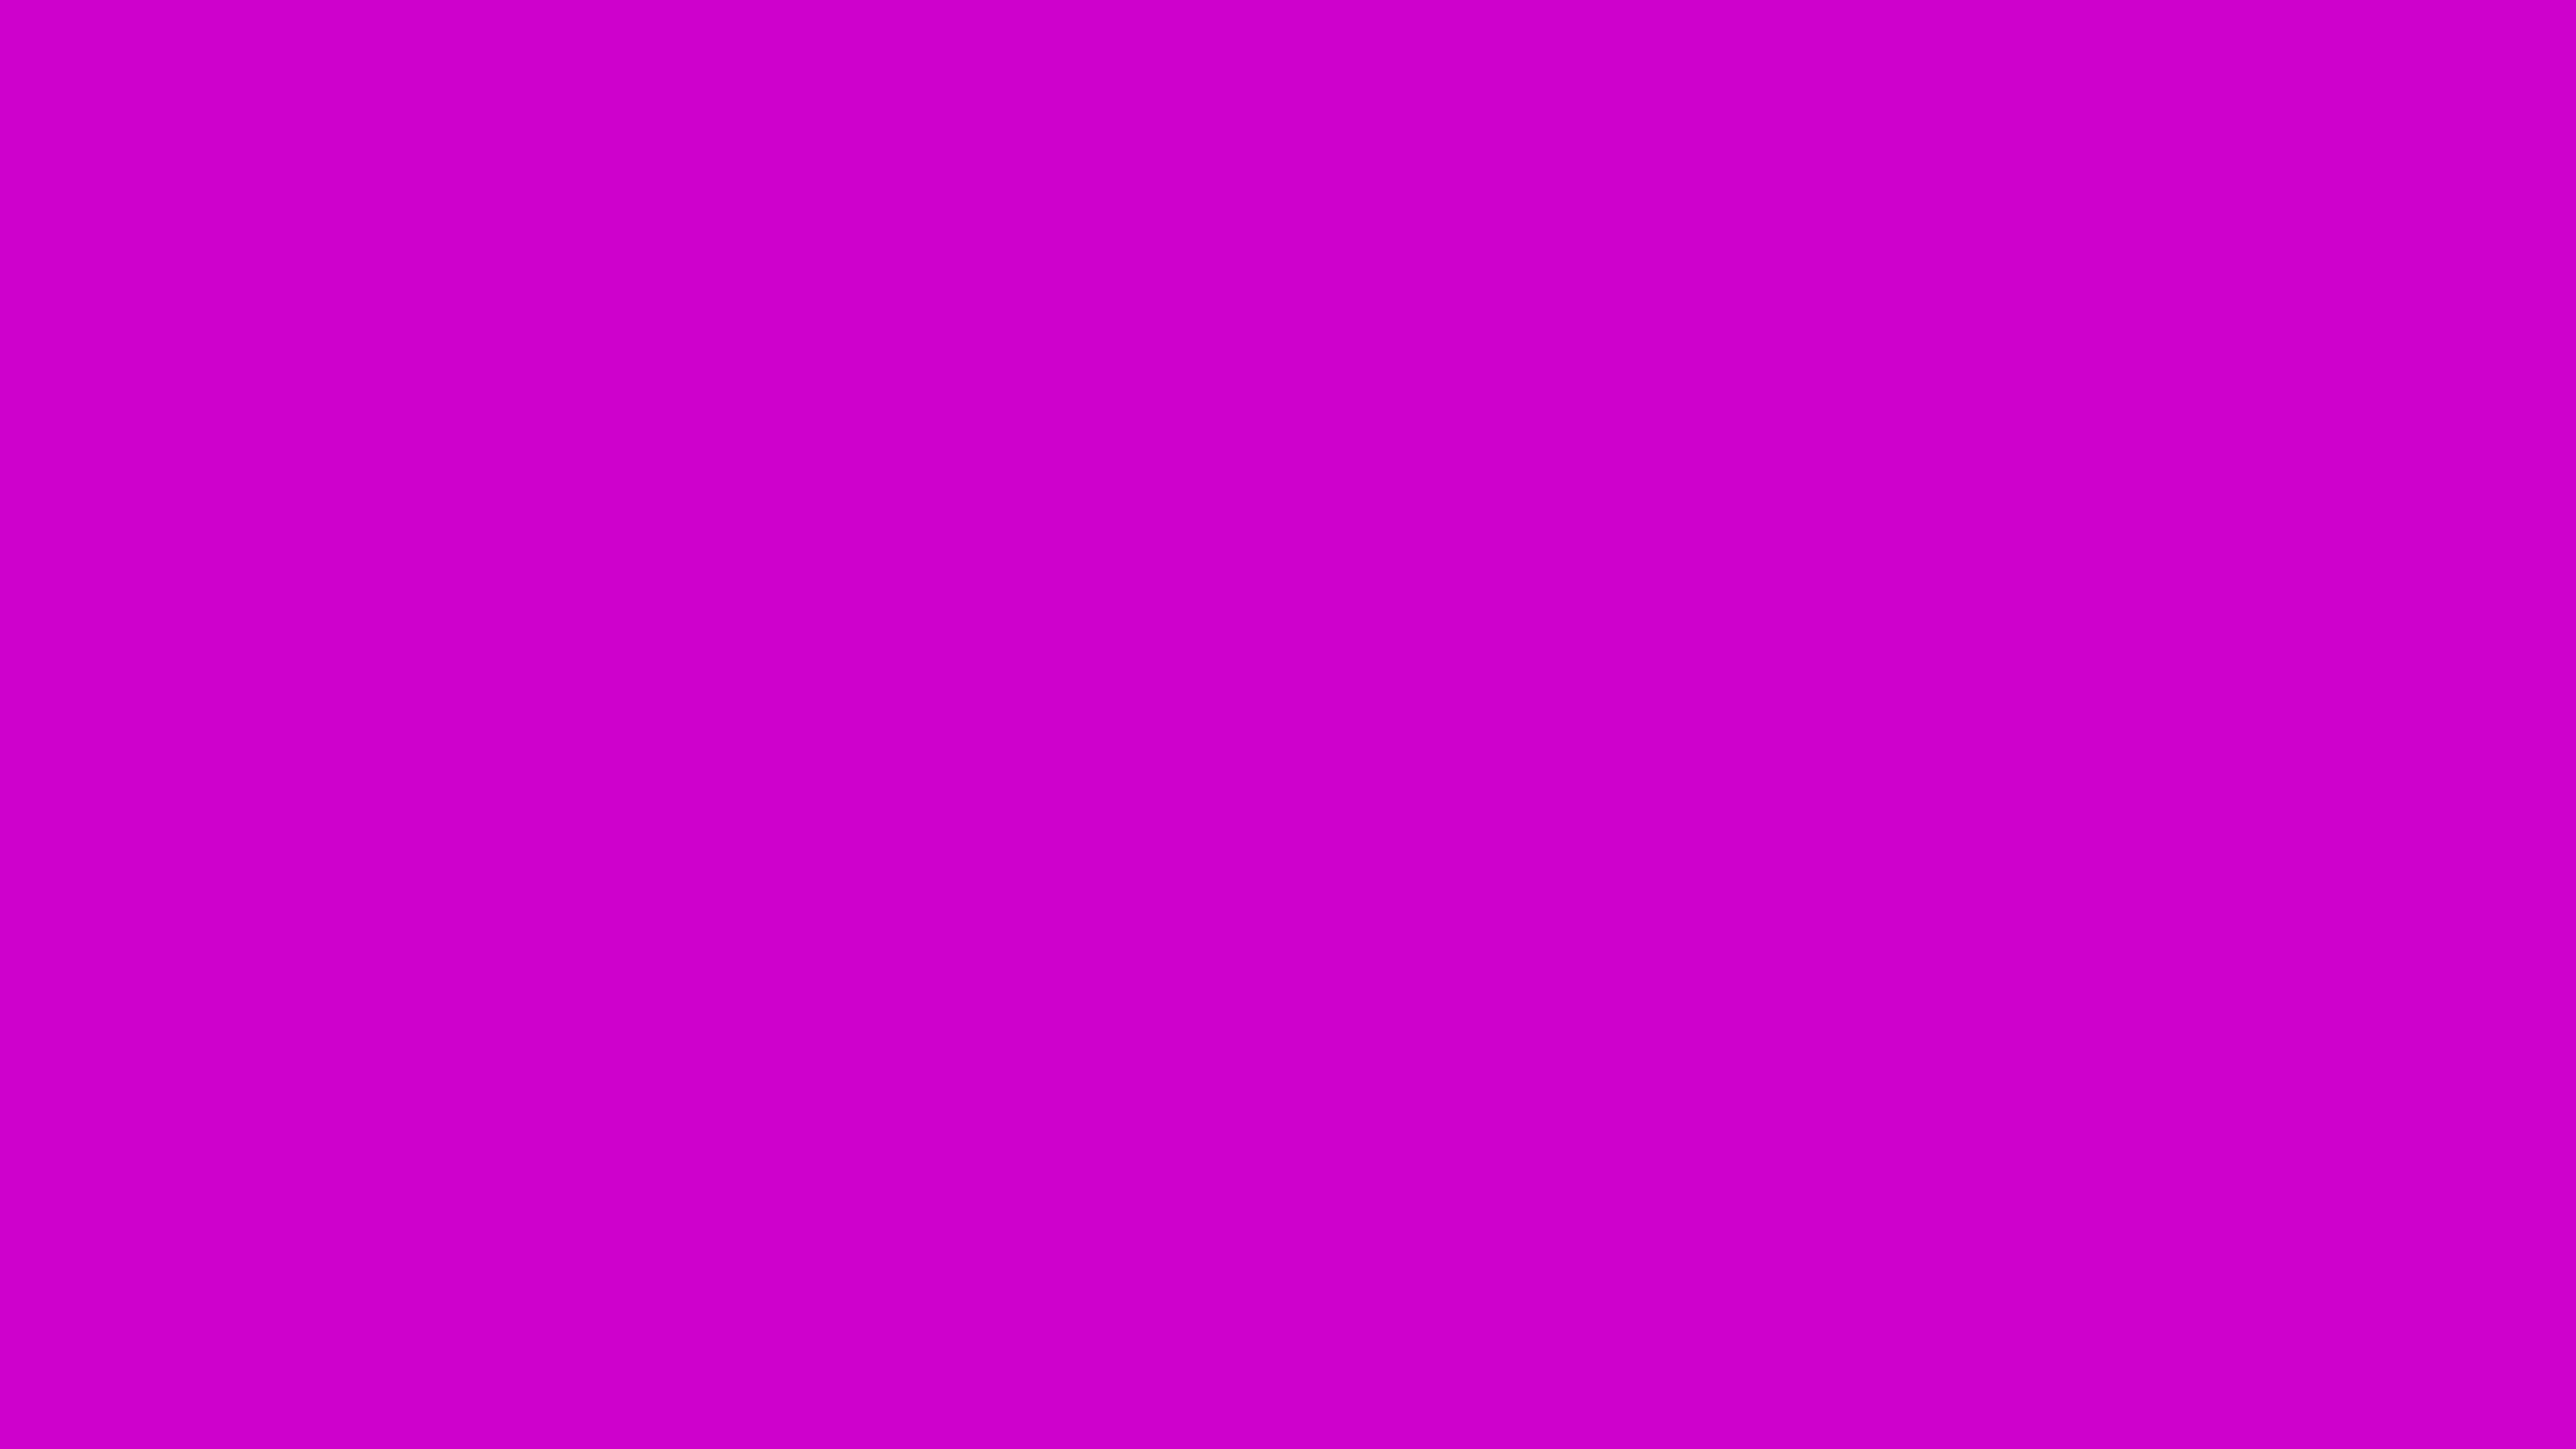 3840x2160 Deep Magenta Solid Color Background